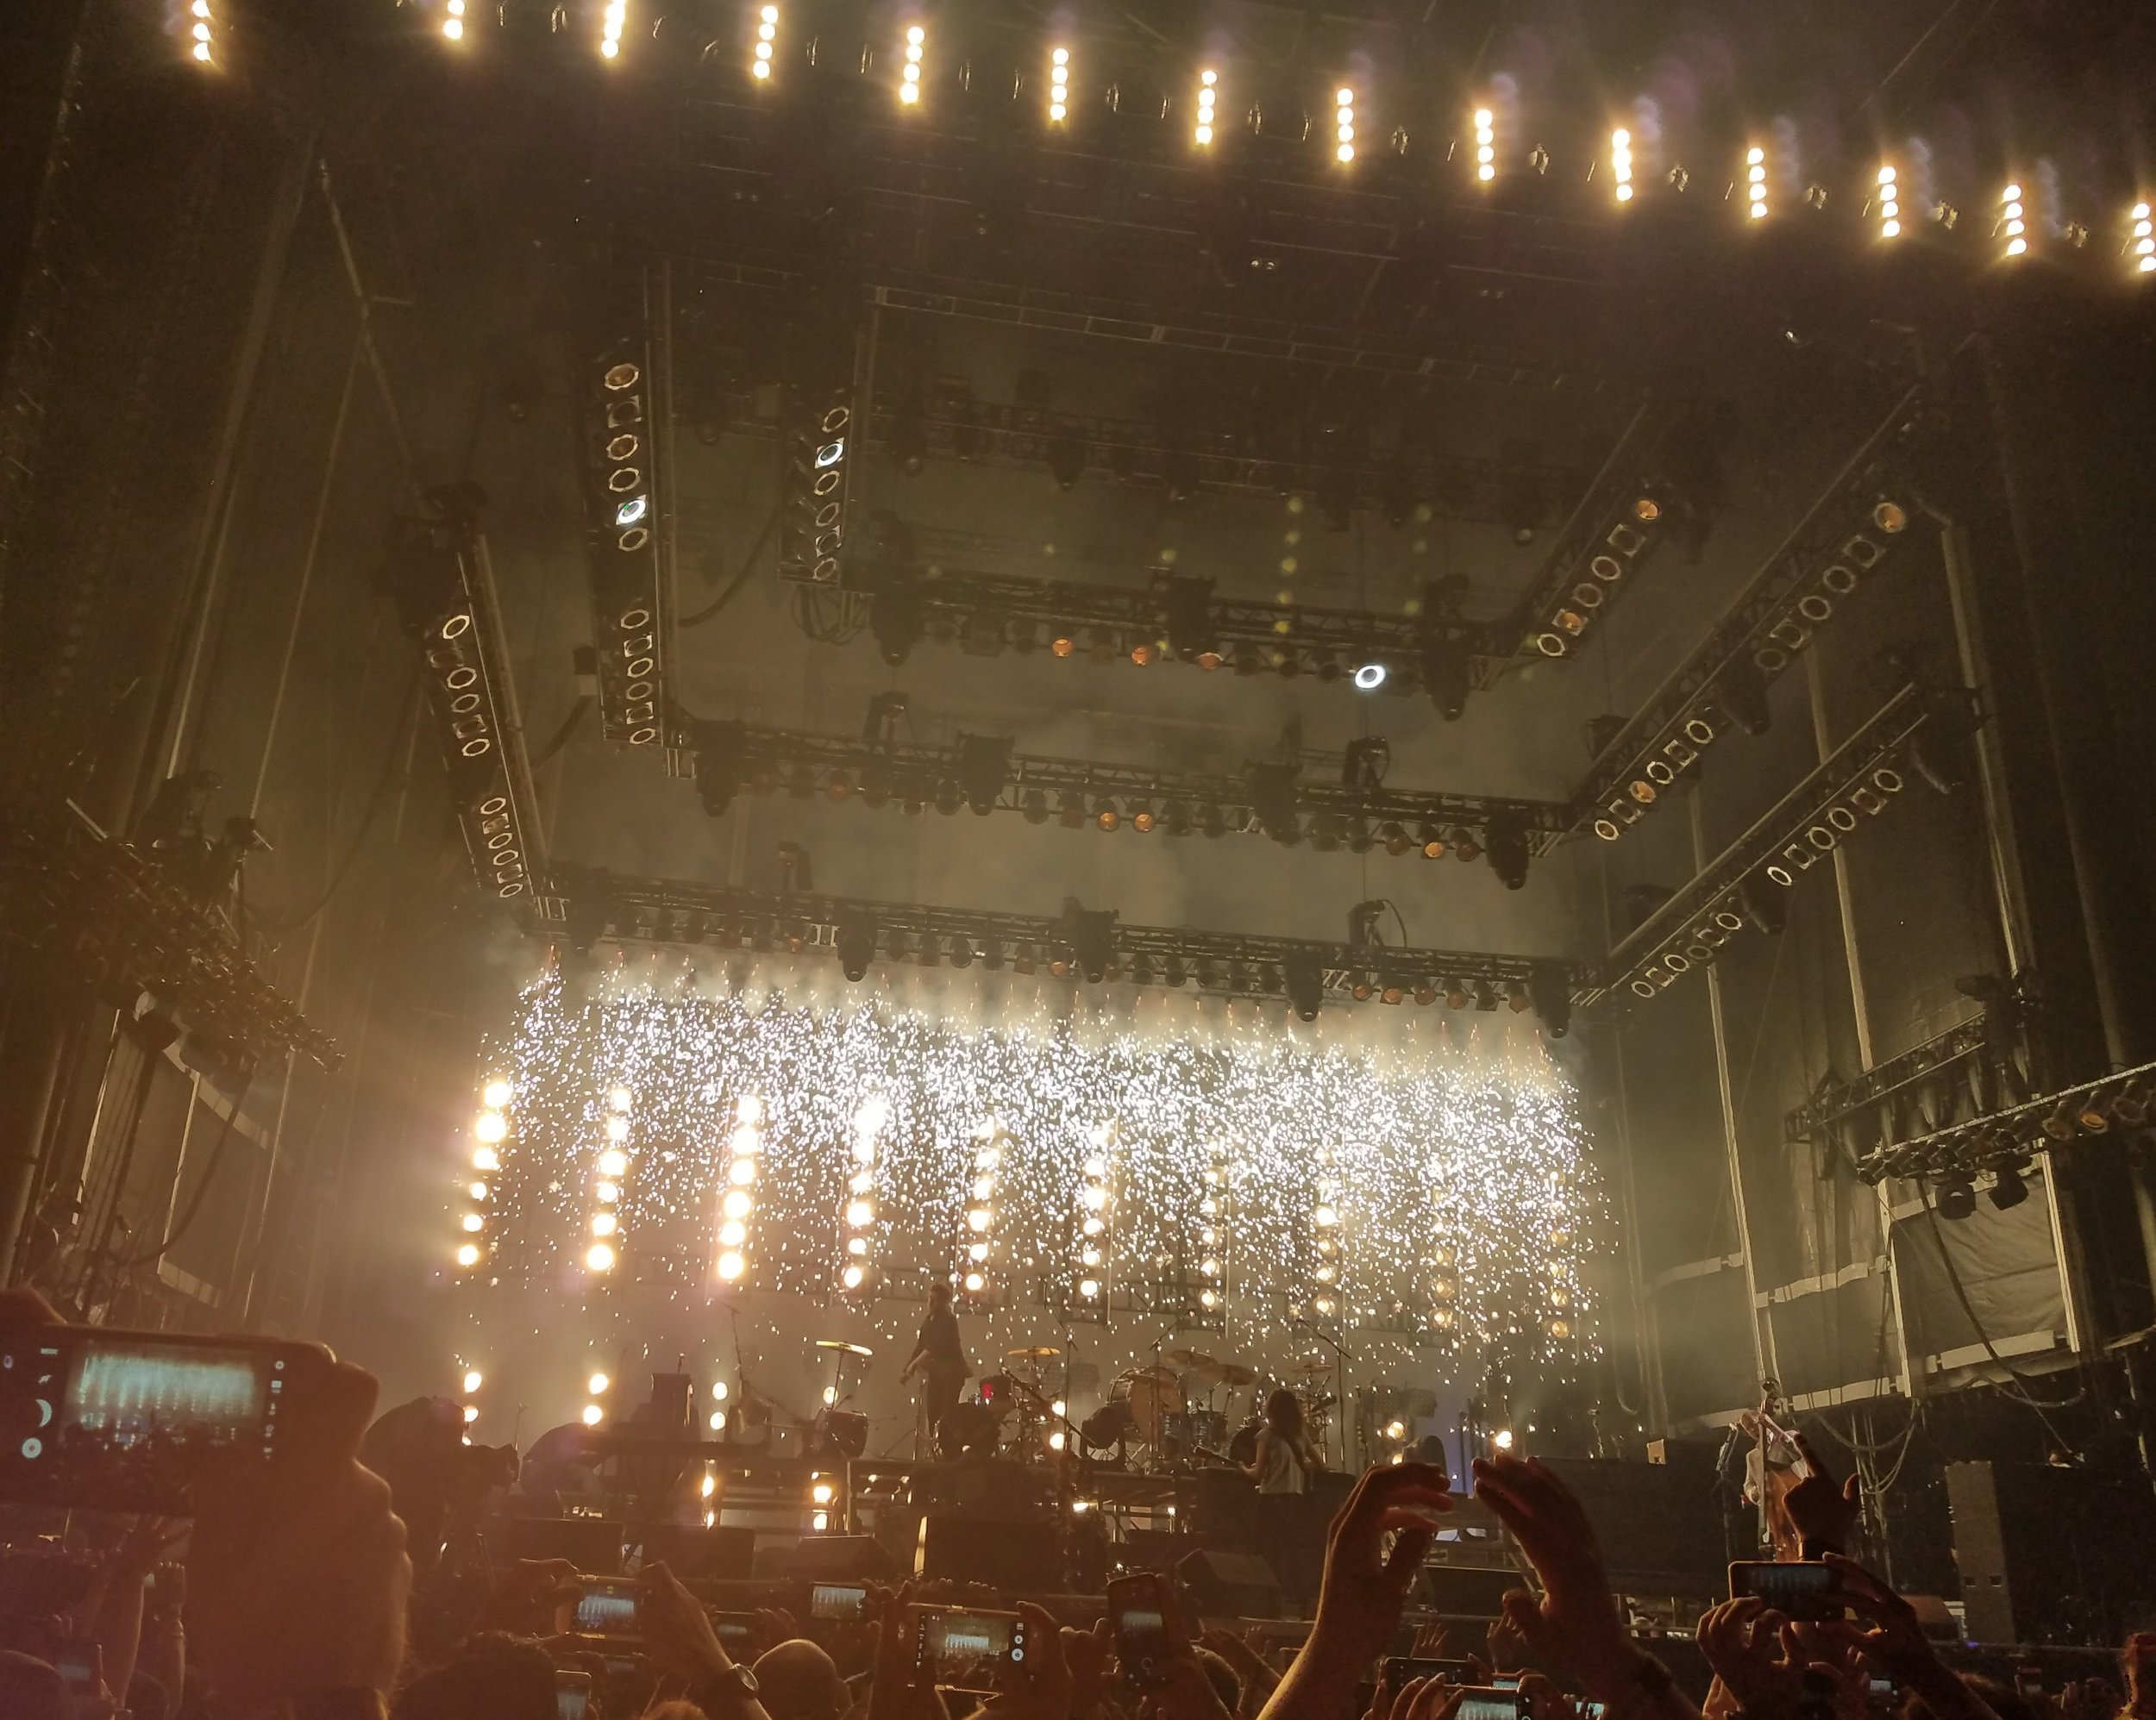 MUSIC FESTIVALS MASTER PLANNING & STAGE DESIGN -